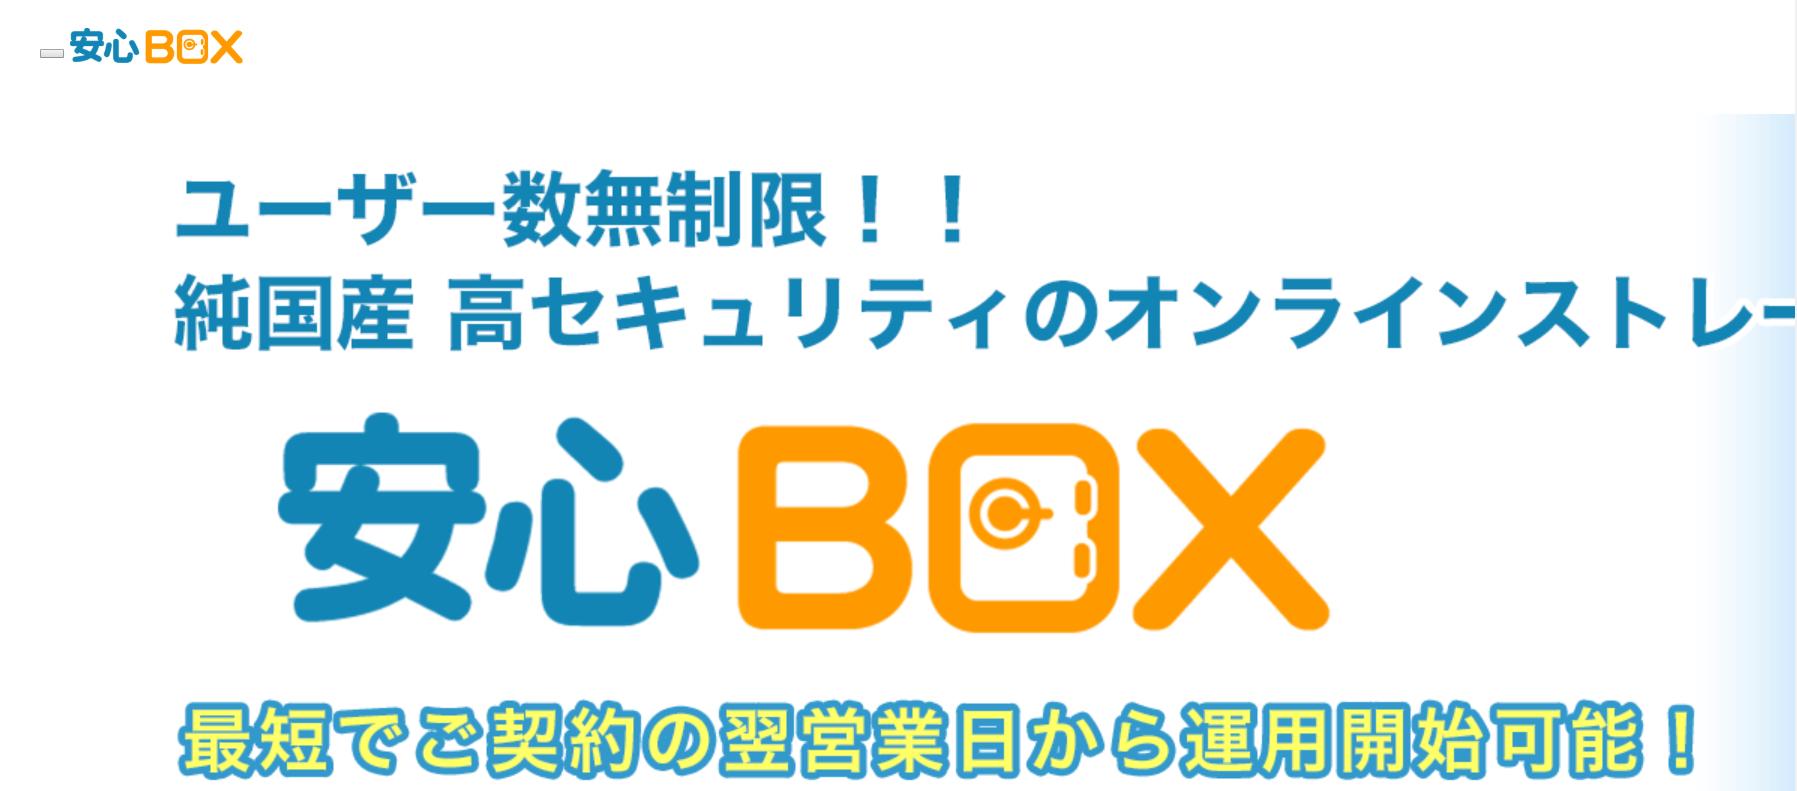 安心BOX